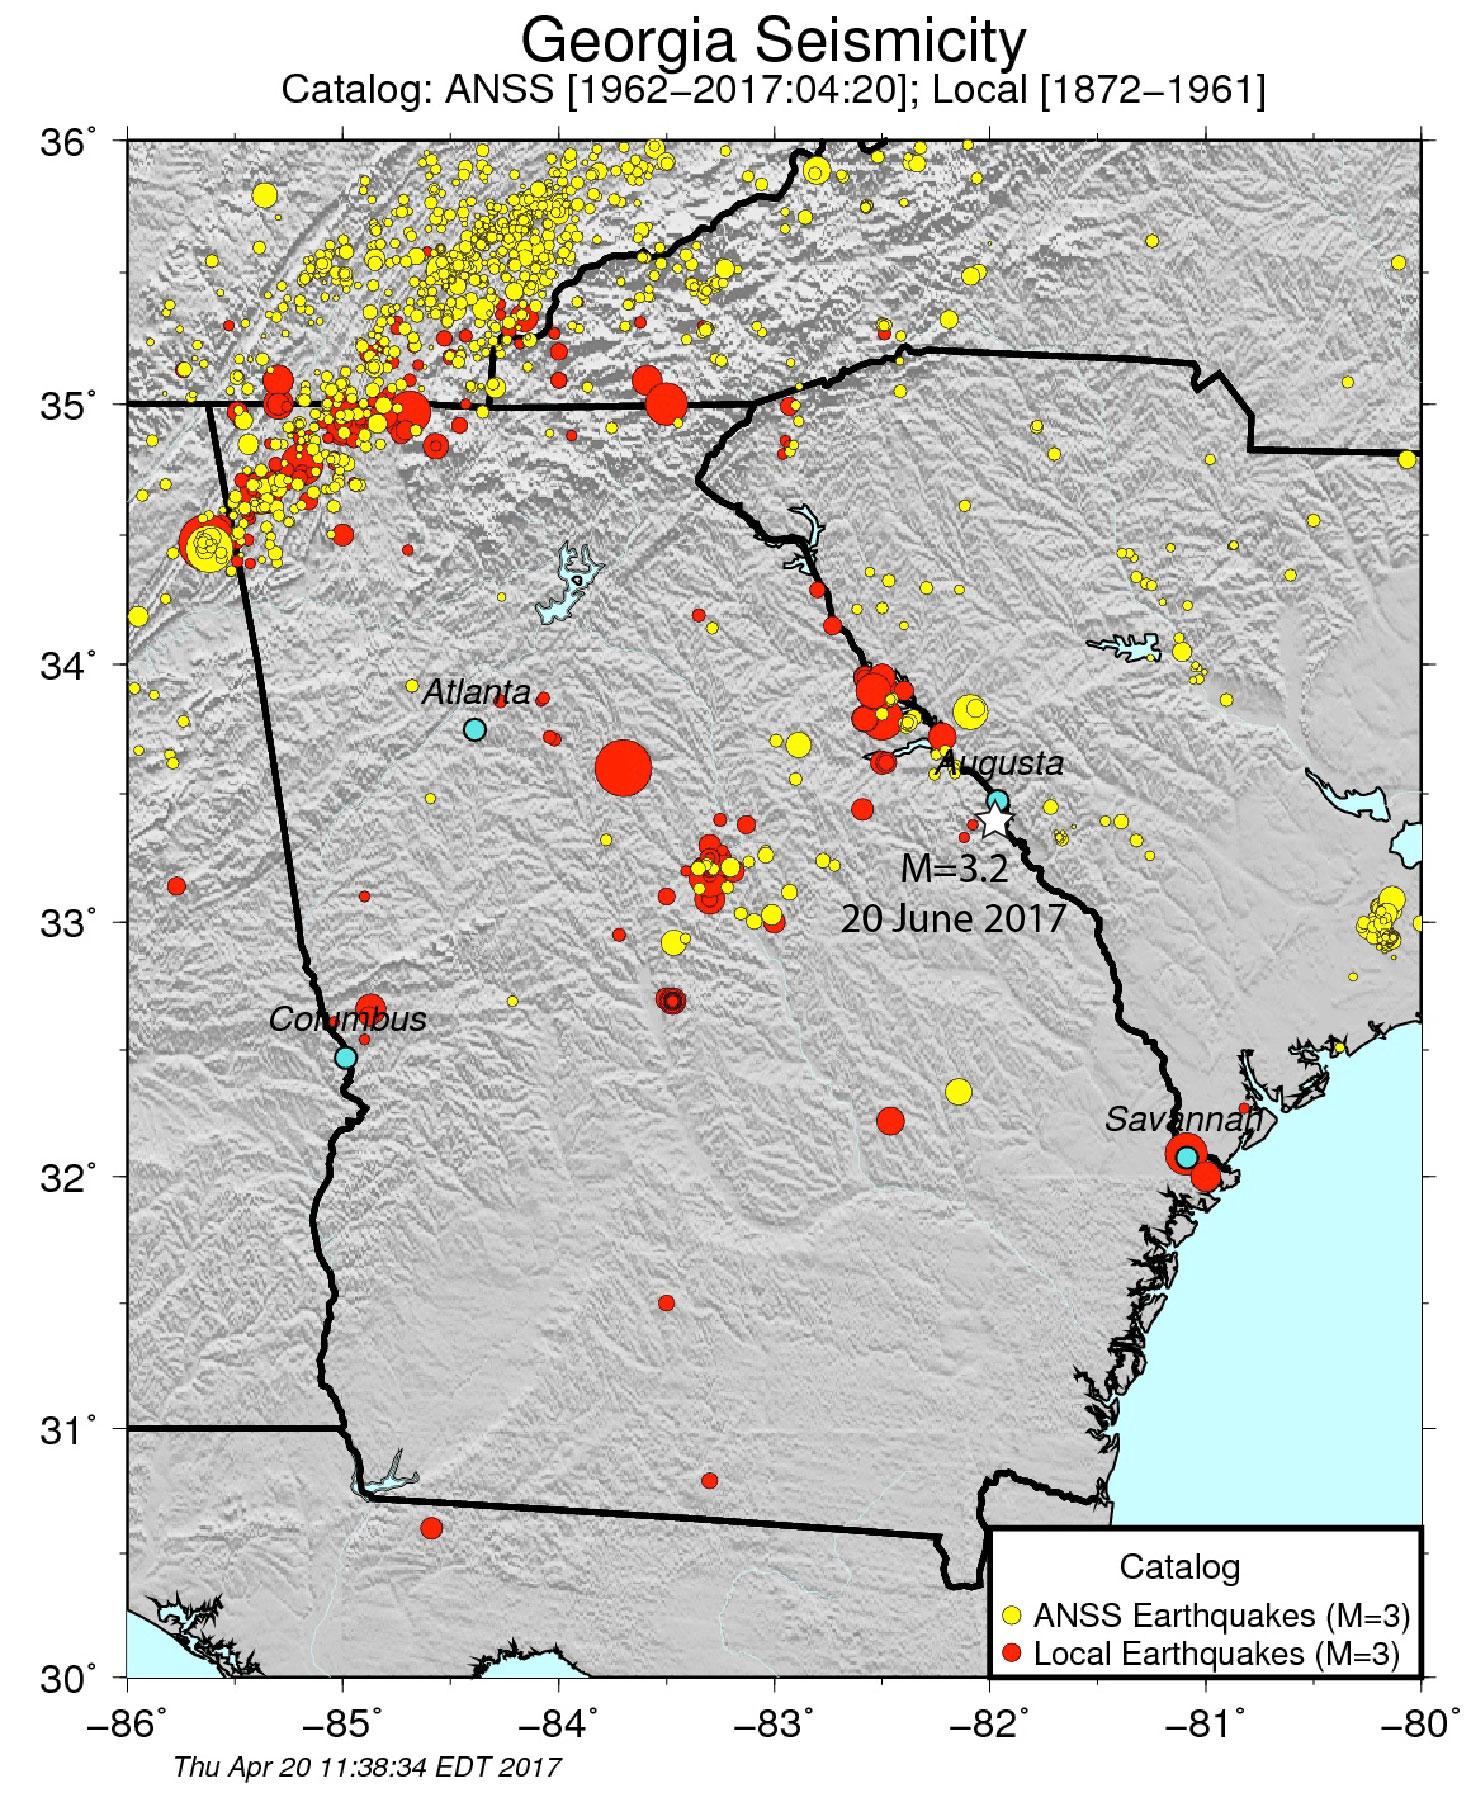 augusta-earthquake-map-georgia-seismicity-map